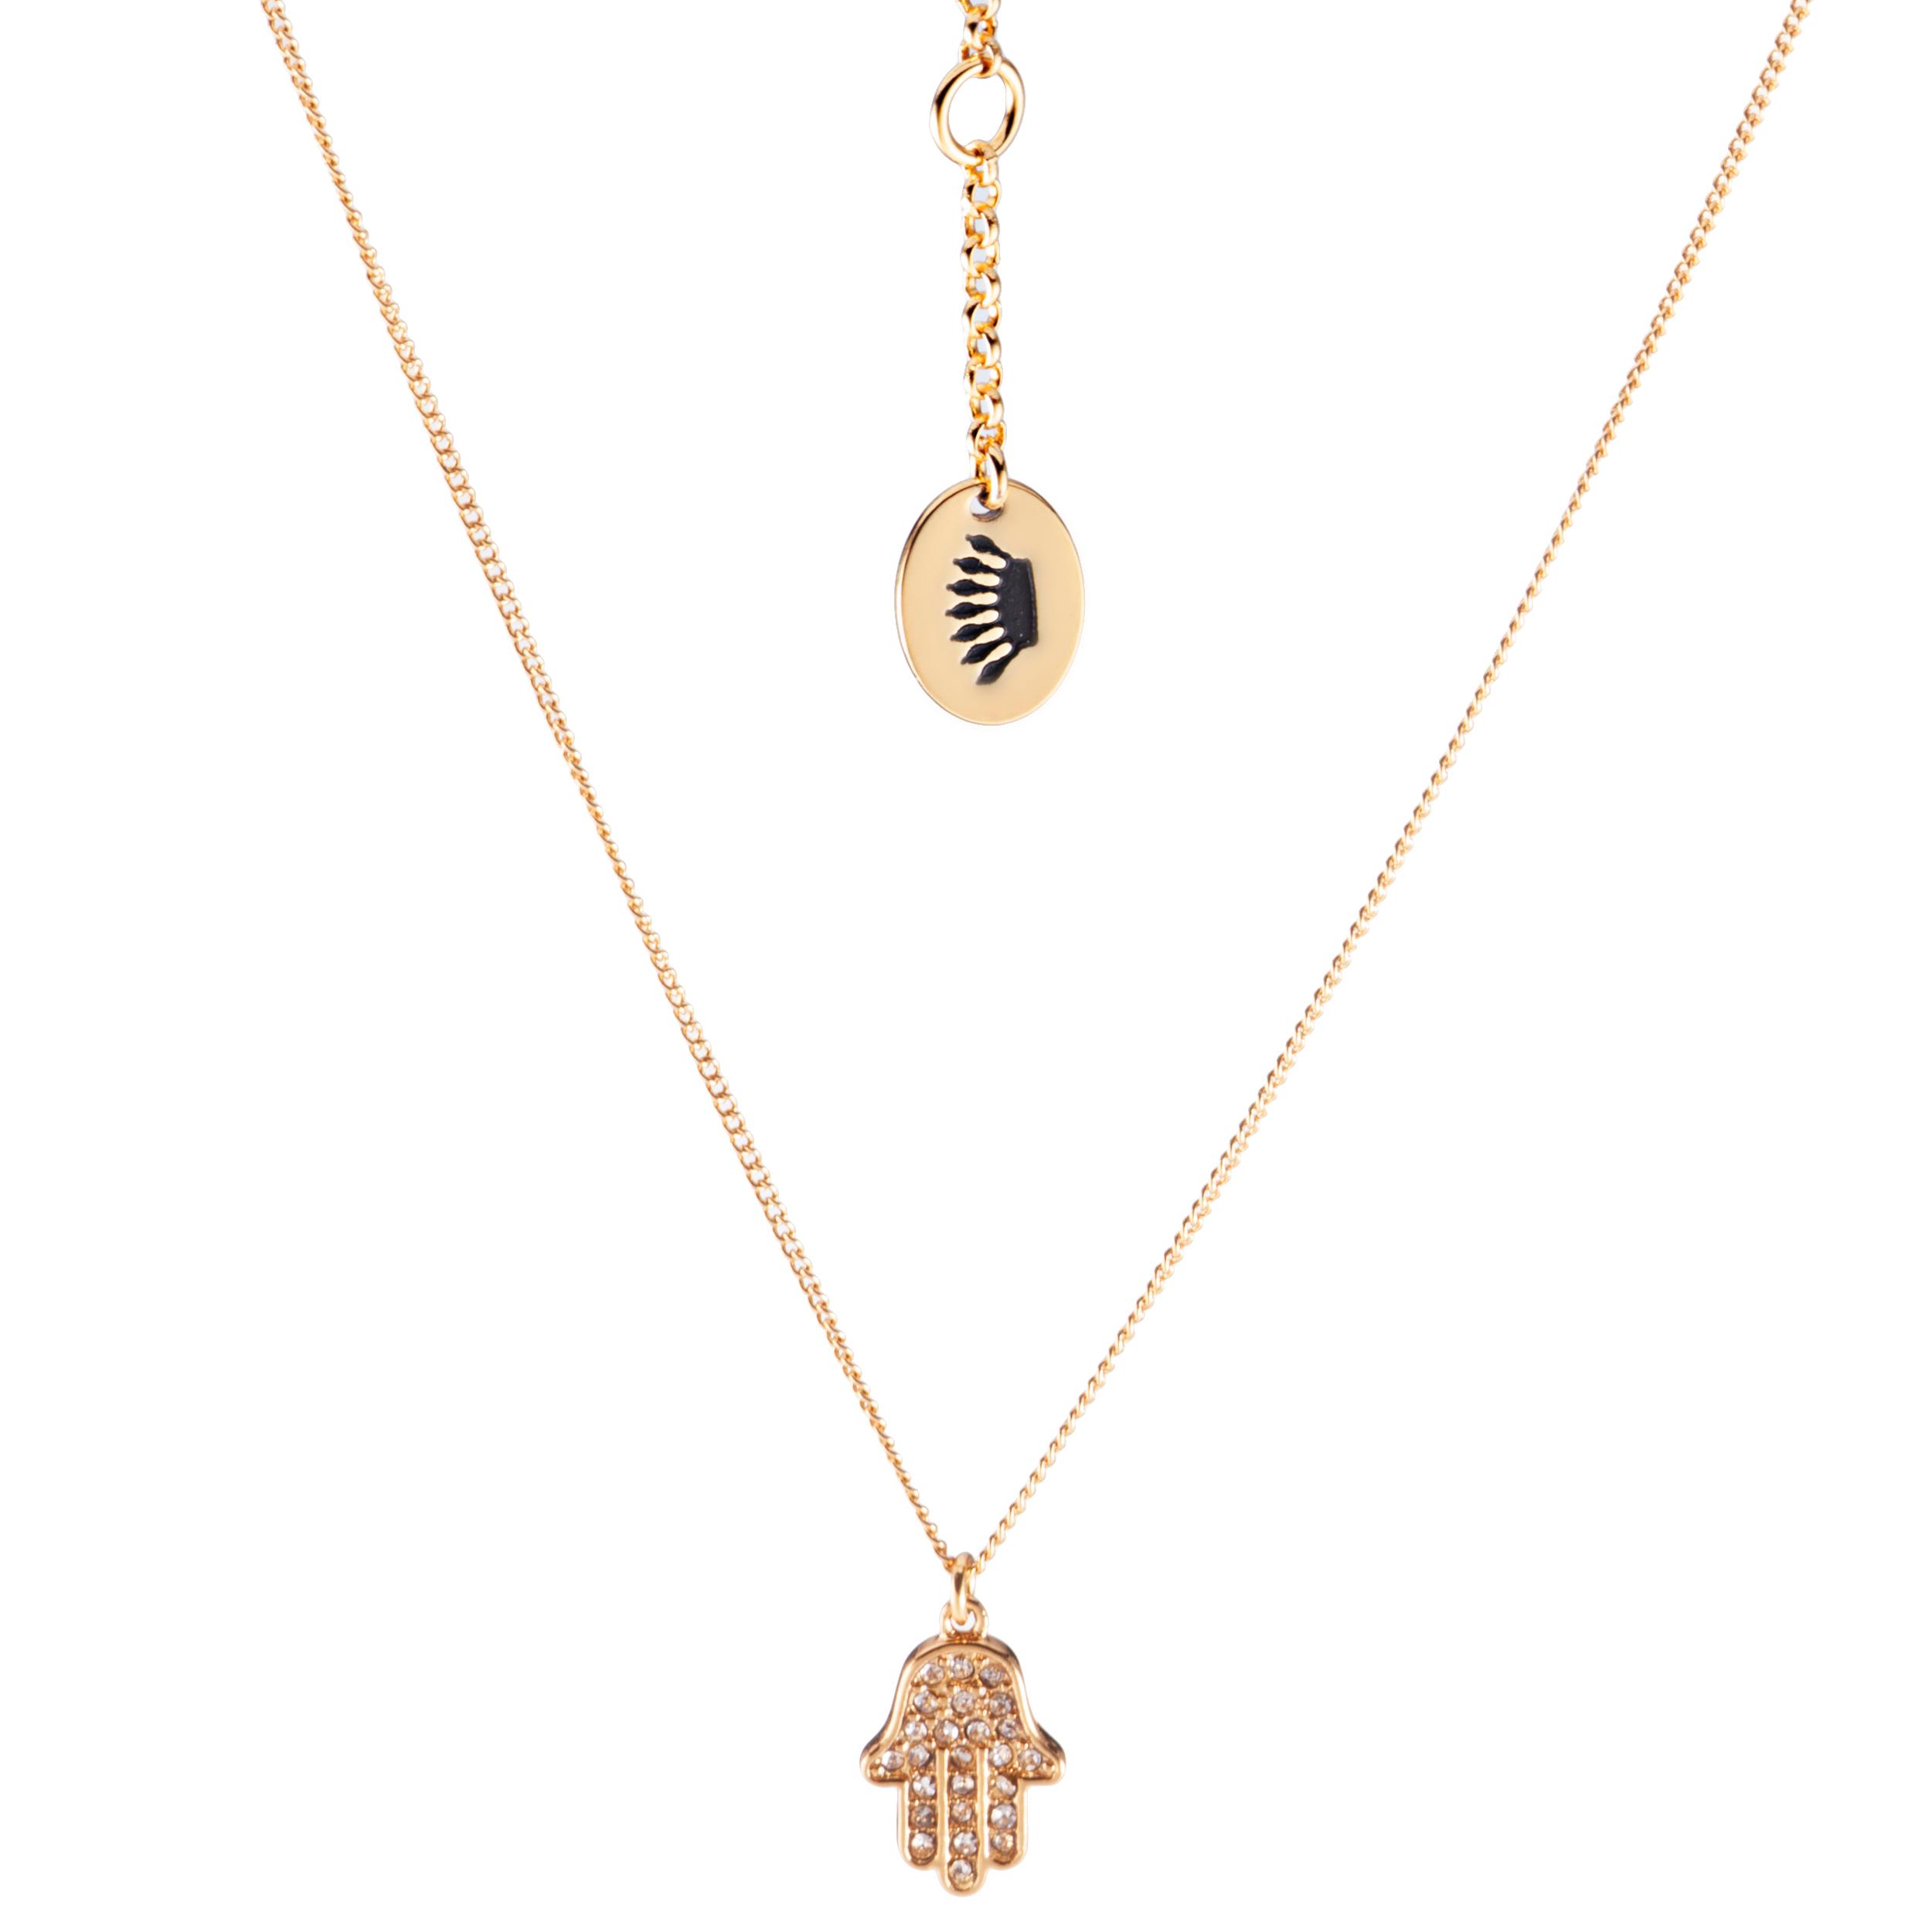 Juicy Couture Hamsa Hand Pendant Necklace-Gold | eBay